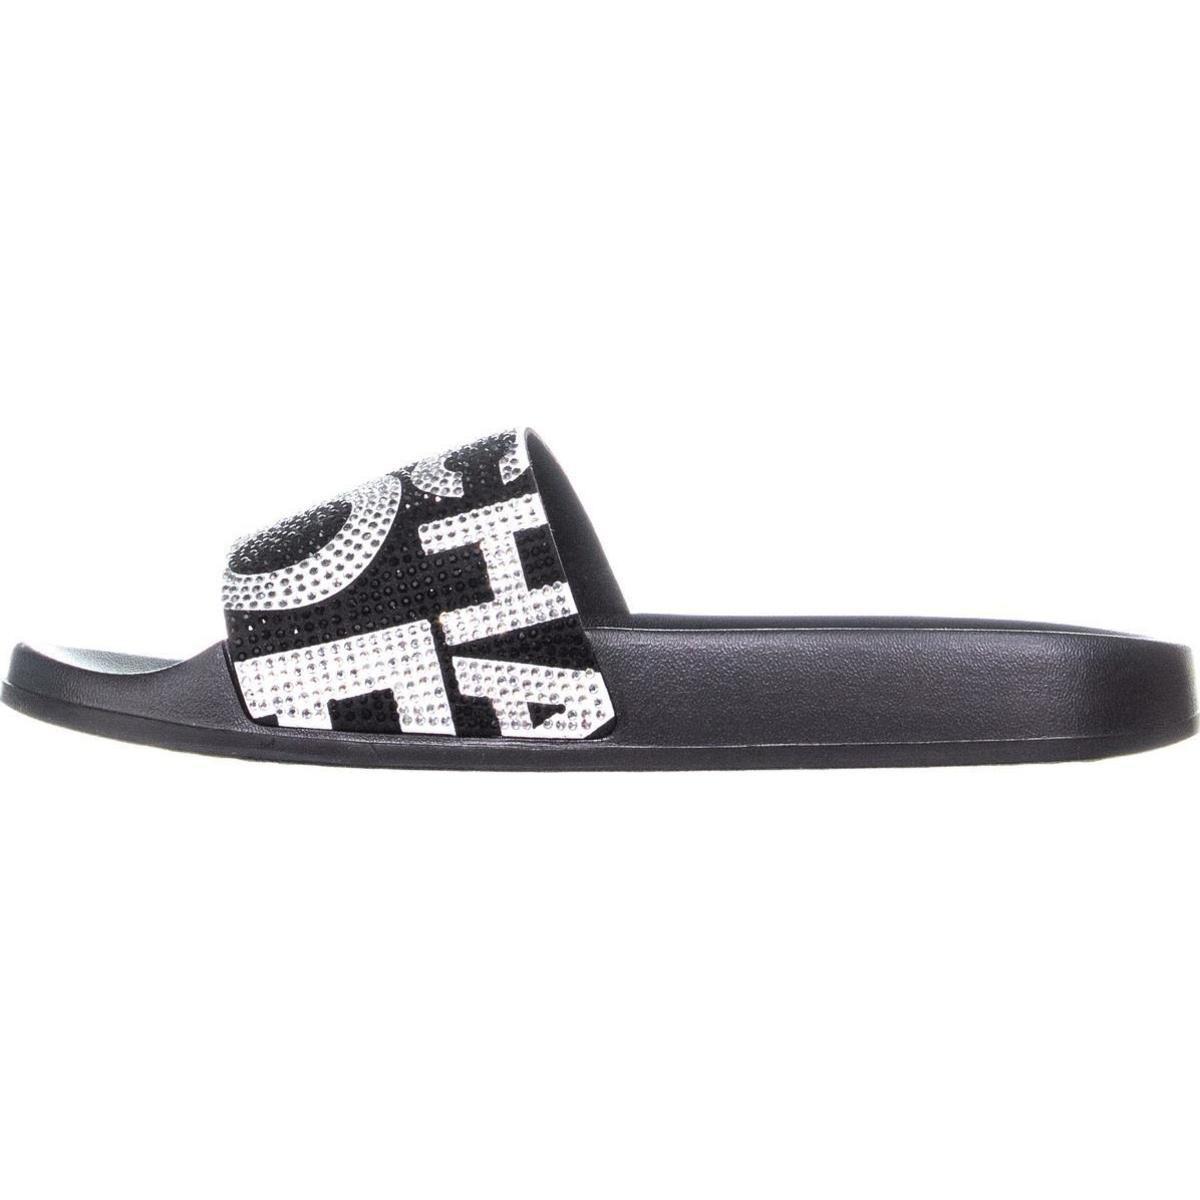 Lyst Michael Kors Gilmore Slide Sandals Black Optic White Clarette Sneakers Clarissa View Fullscreen